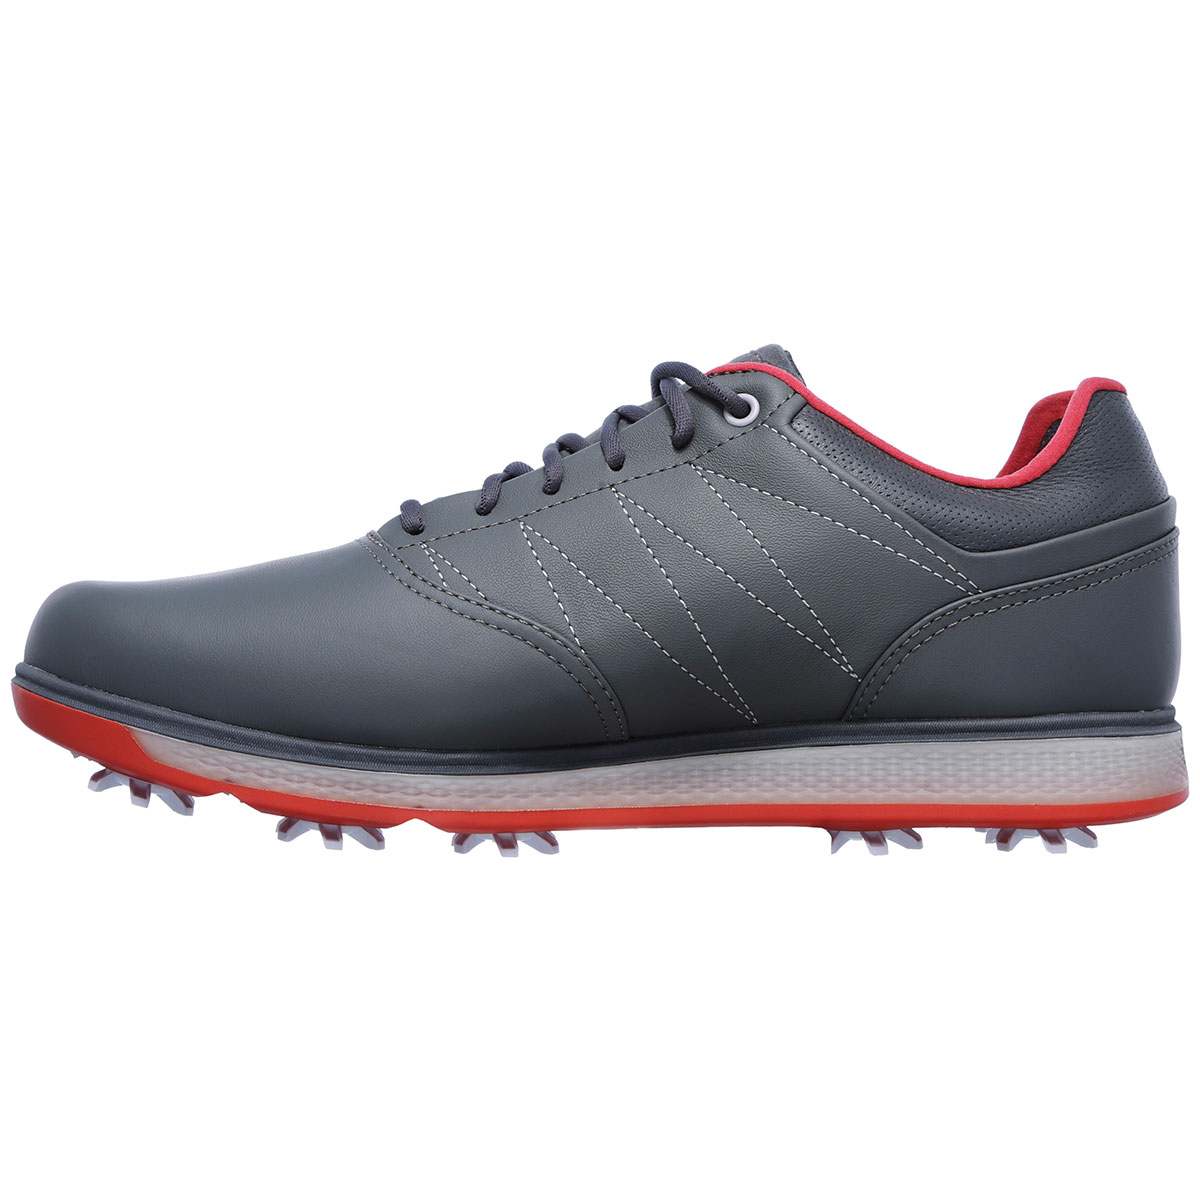 on wholesale fashion biggest discount Skechers Go Golf Pro V3 Shoes